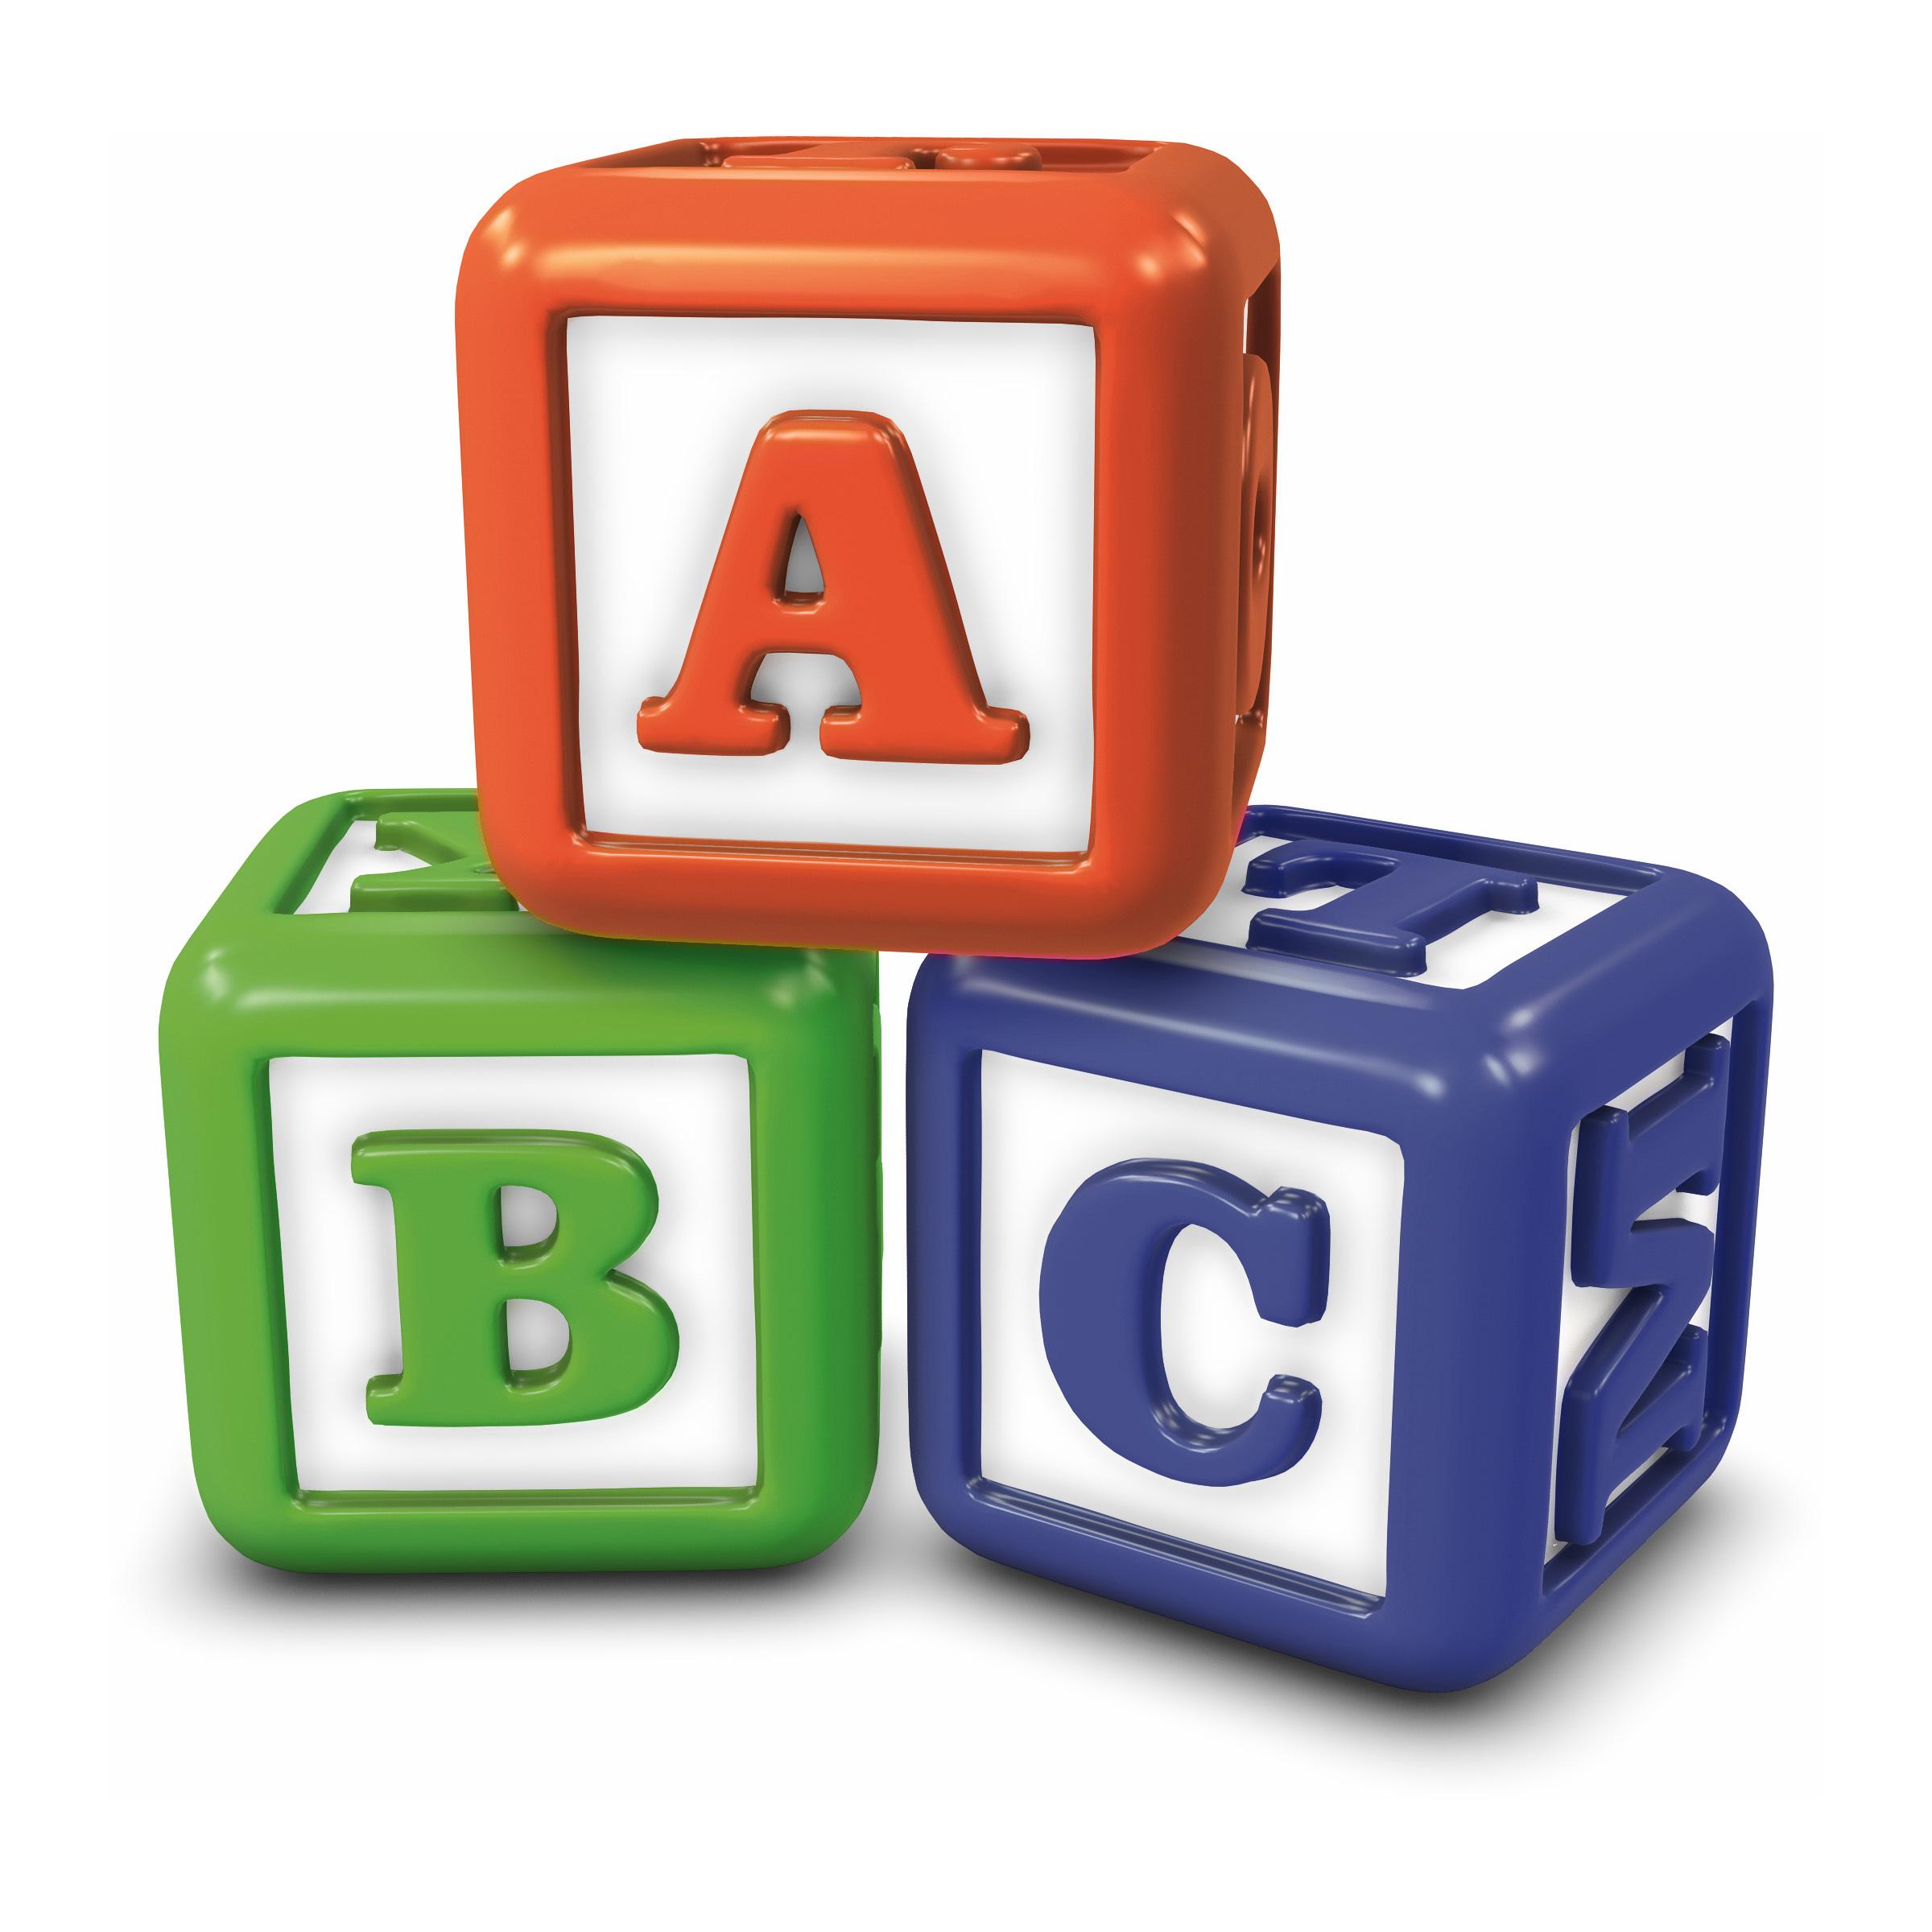 Abc block clipart graphic transparent Abc Building Blocks Clipart - Clipart Kid graphic transparent